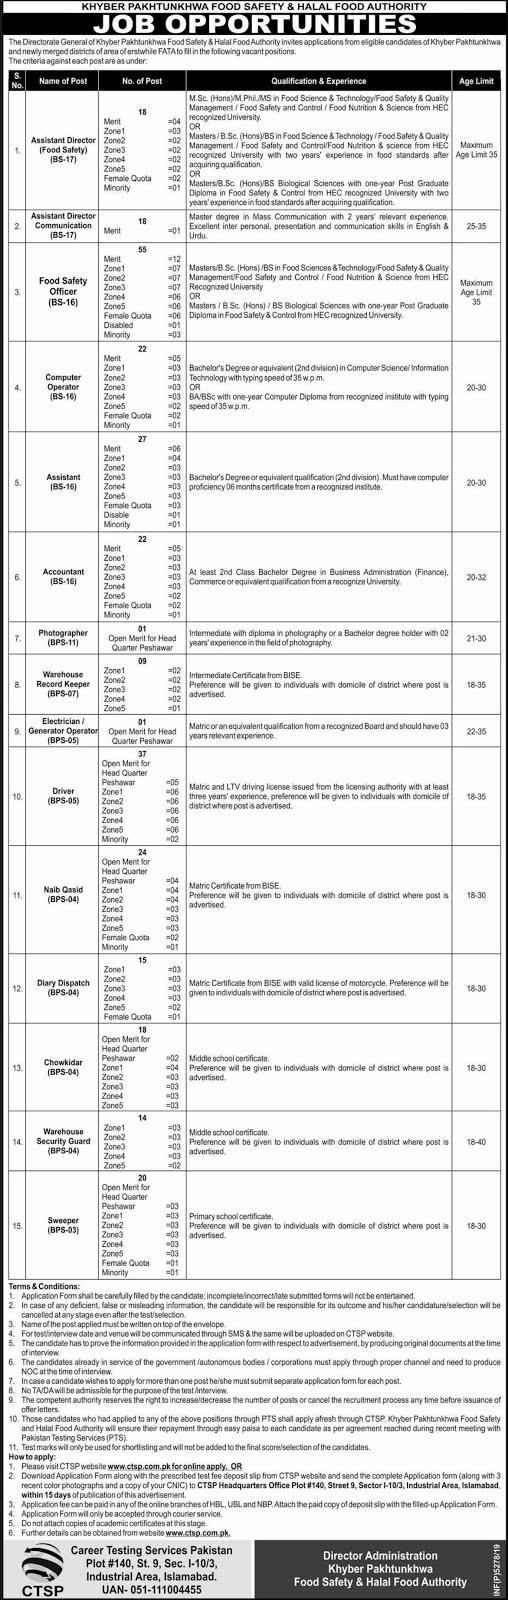 Khyber Pakhtunkhwa Food Safety & Halal Food Authority Jobs January 2020 (301 Posts)